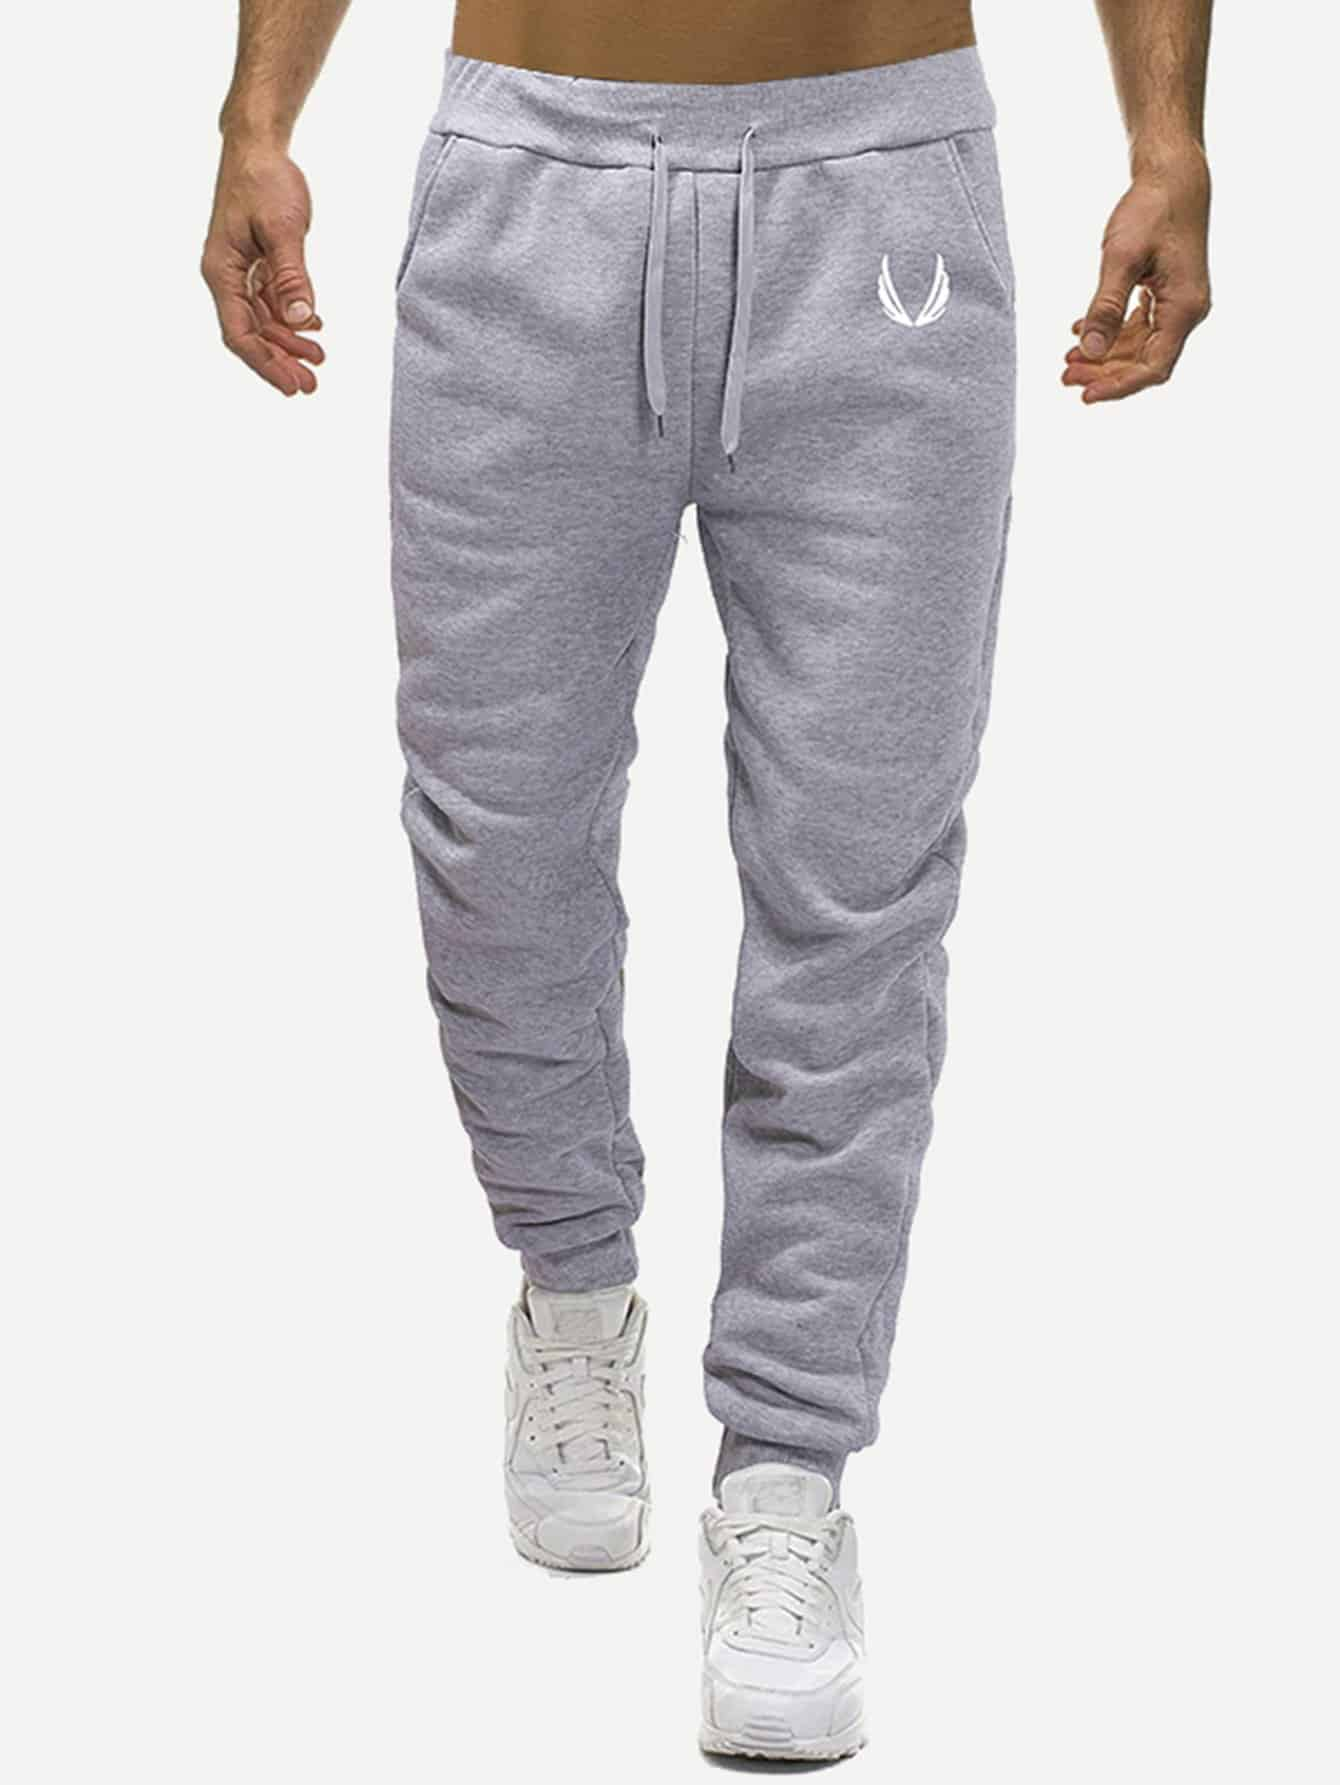 Фото - Мужские брюки с принтом геометрических фигур от SheIn серого цвета